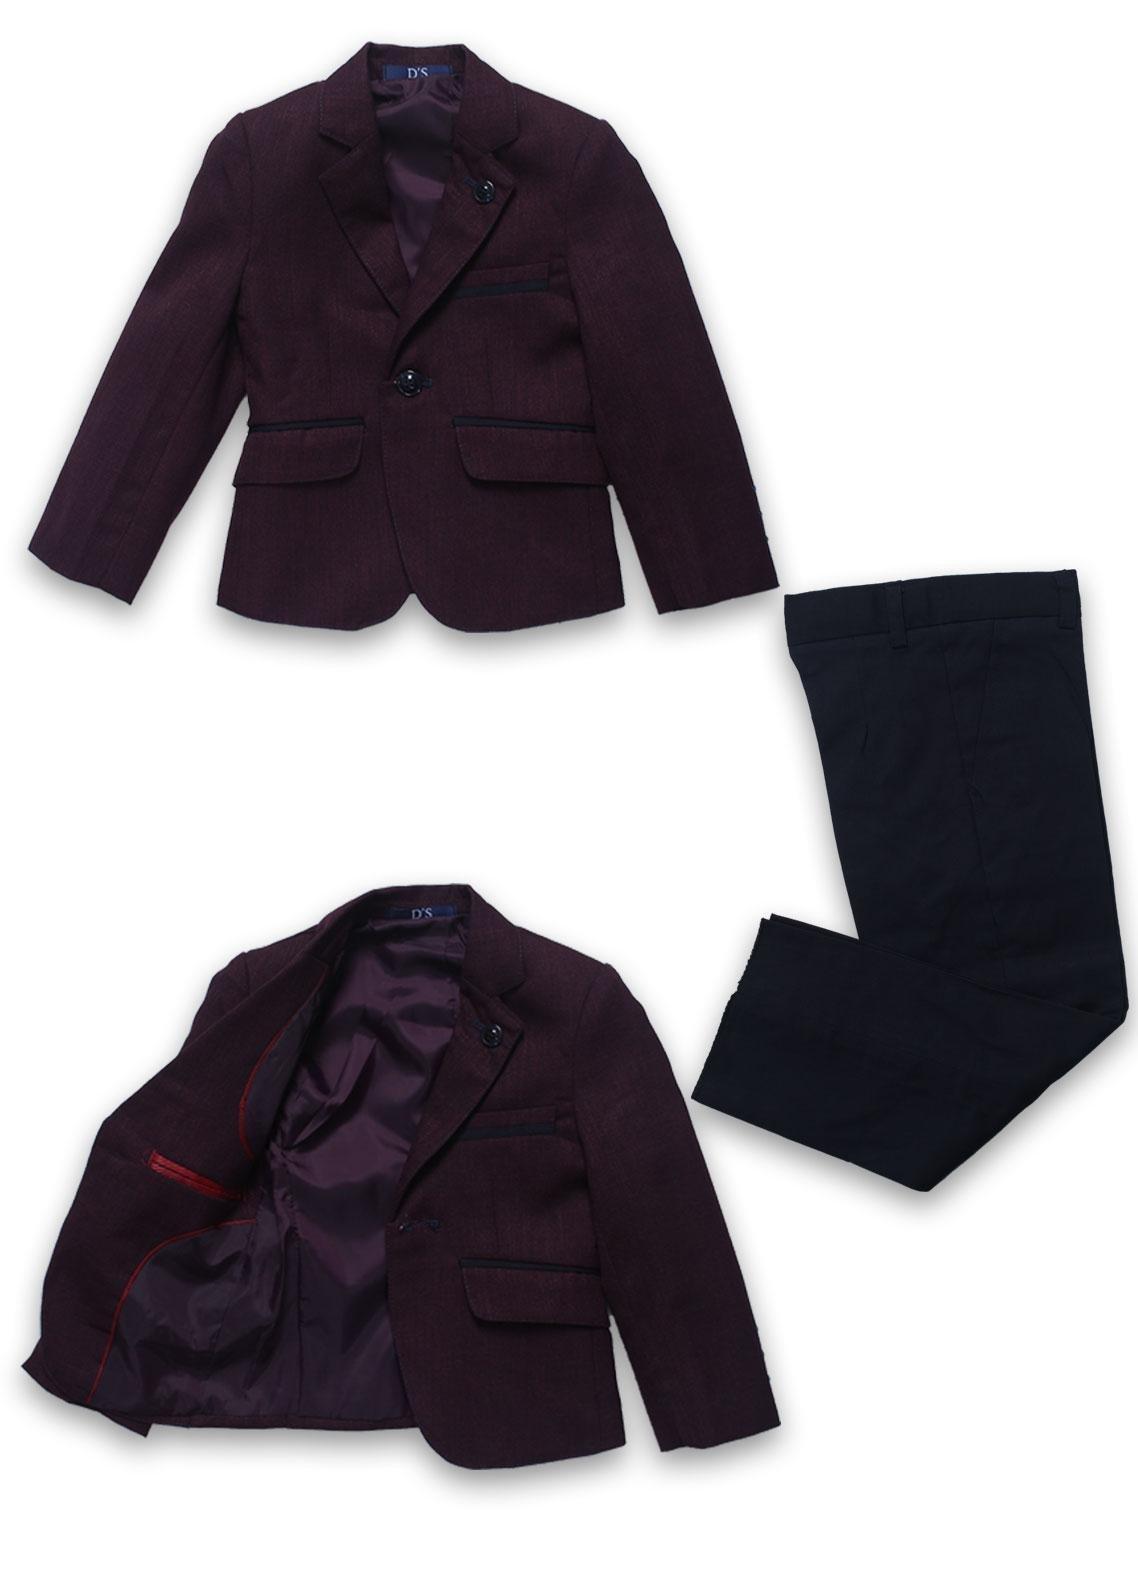 Sanaulla Exclusive Range Cotton Formal Boys Coat Suit -  1001 Maroon